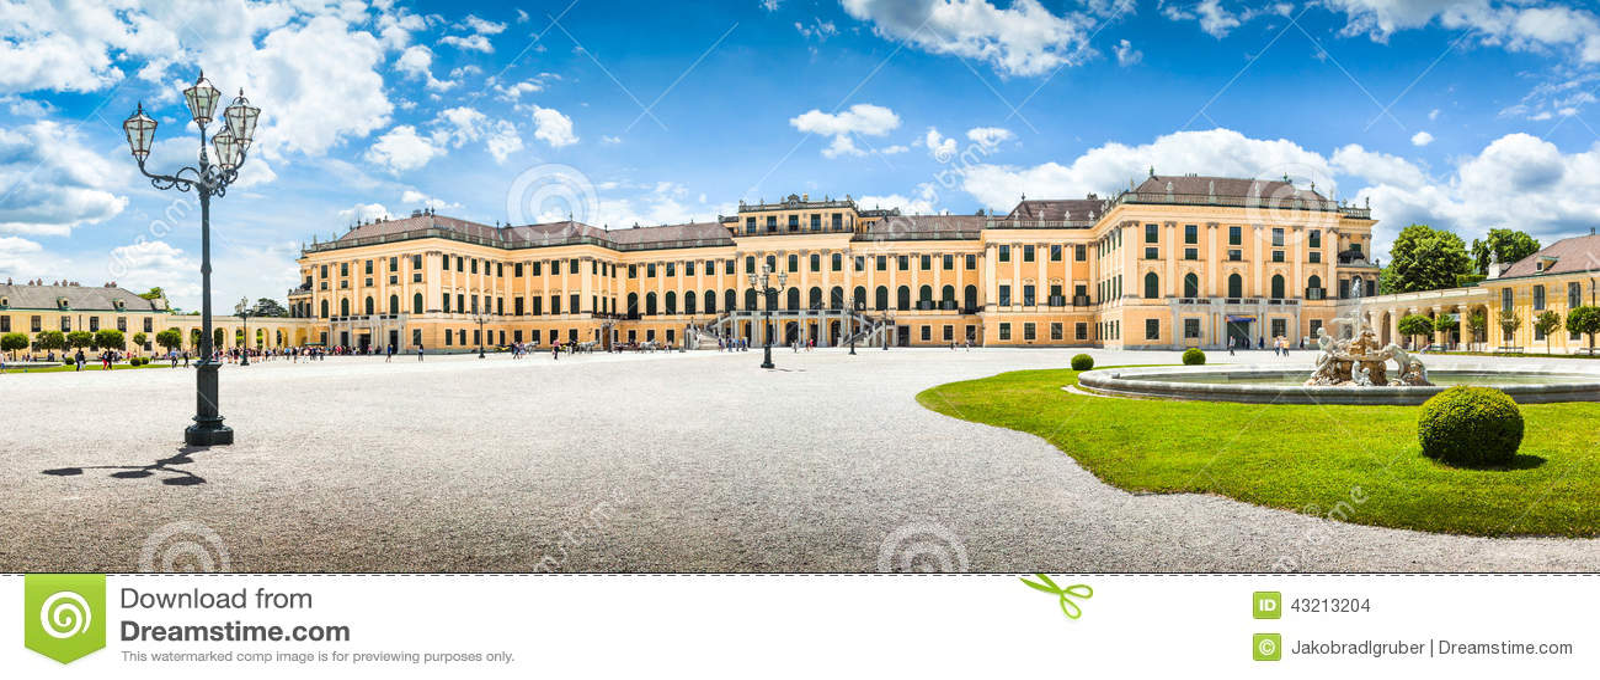 Palácio de Schonbrunn na entrada principal em Viena, Áustria